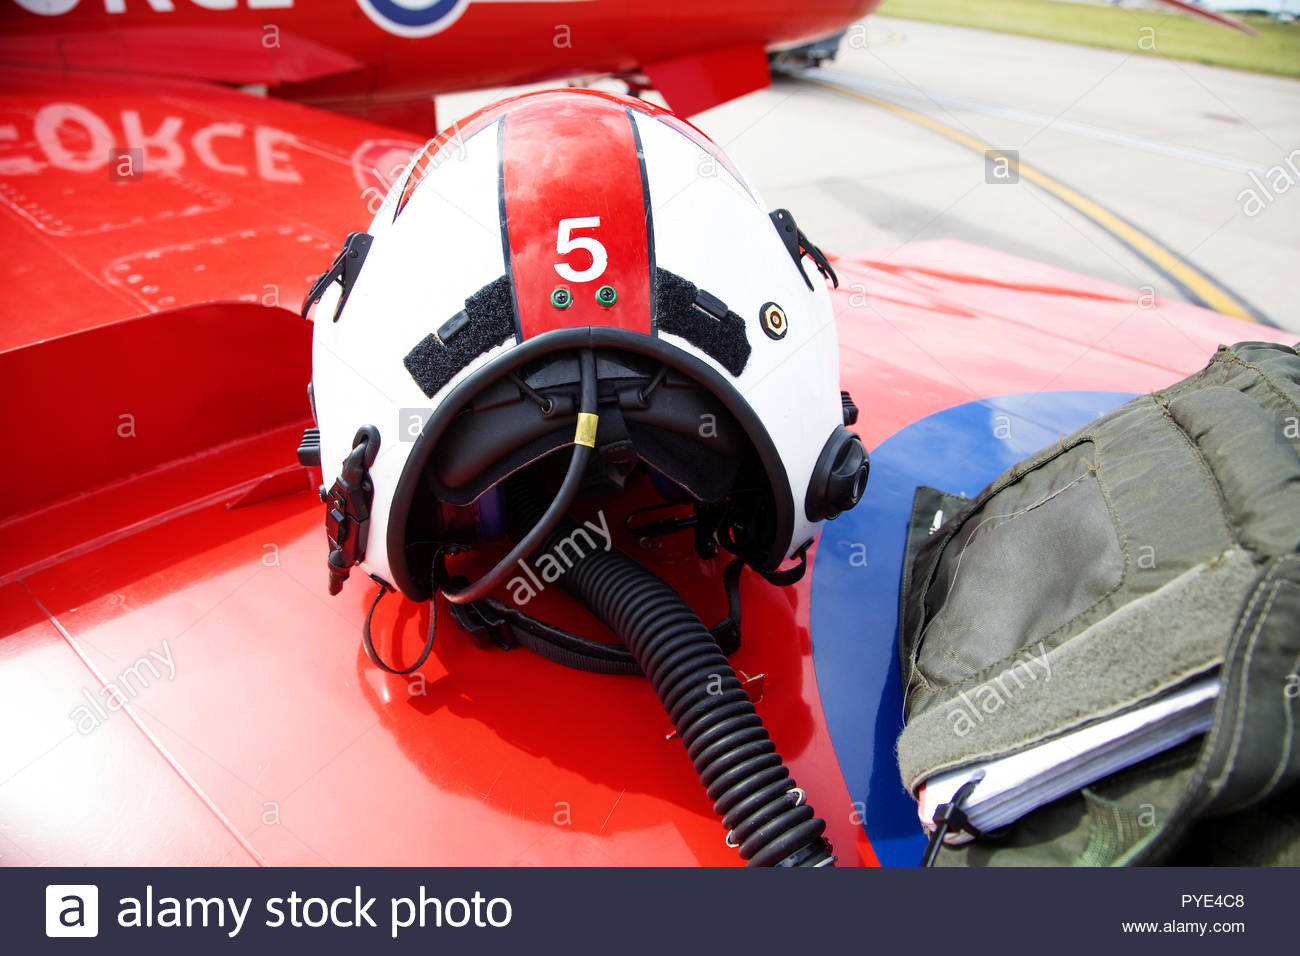 Helmet and bag on wing of Red Arrows airplane on RAF Scrampton, UK - Stock Image